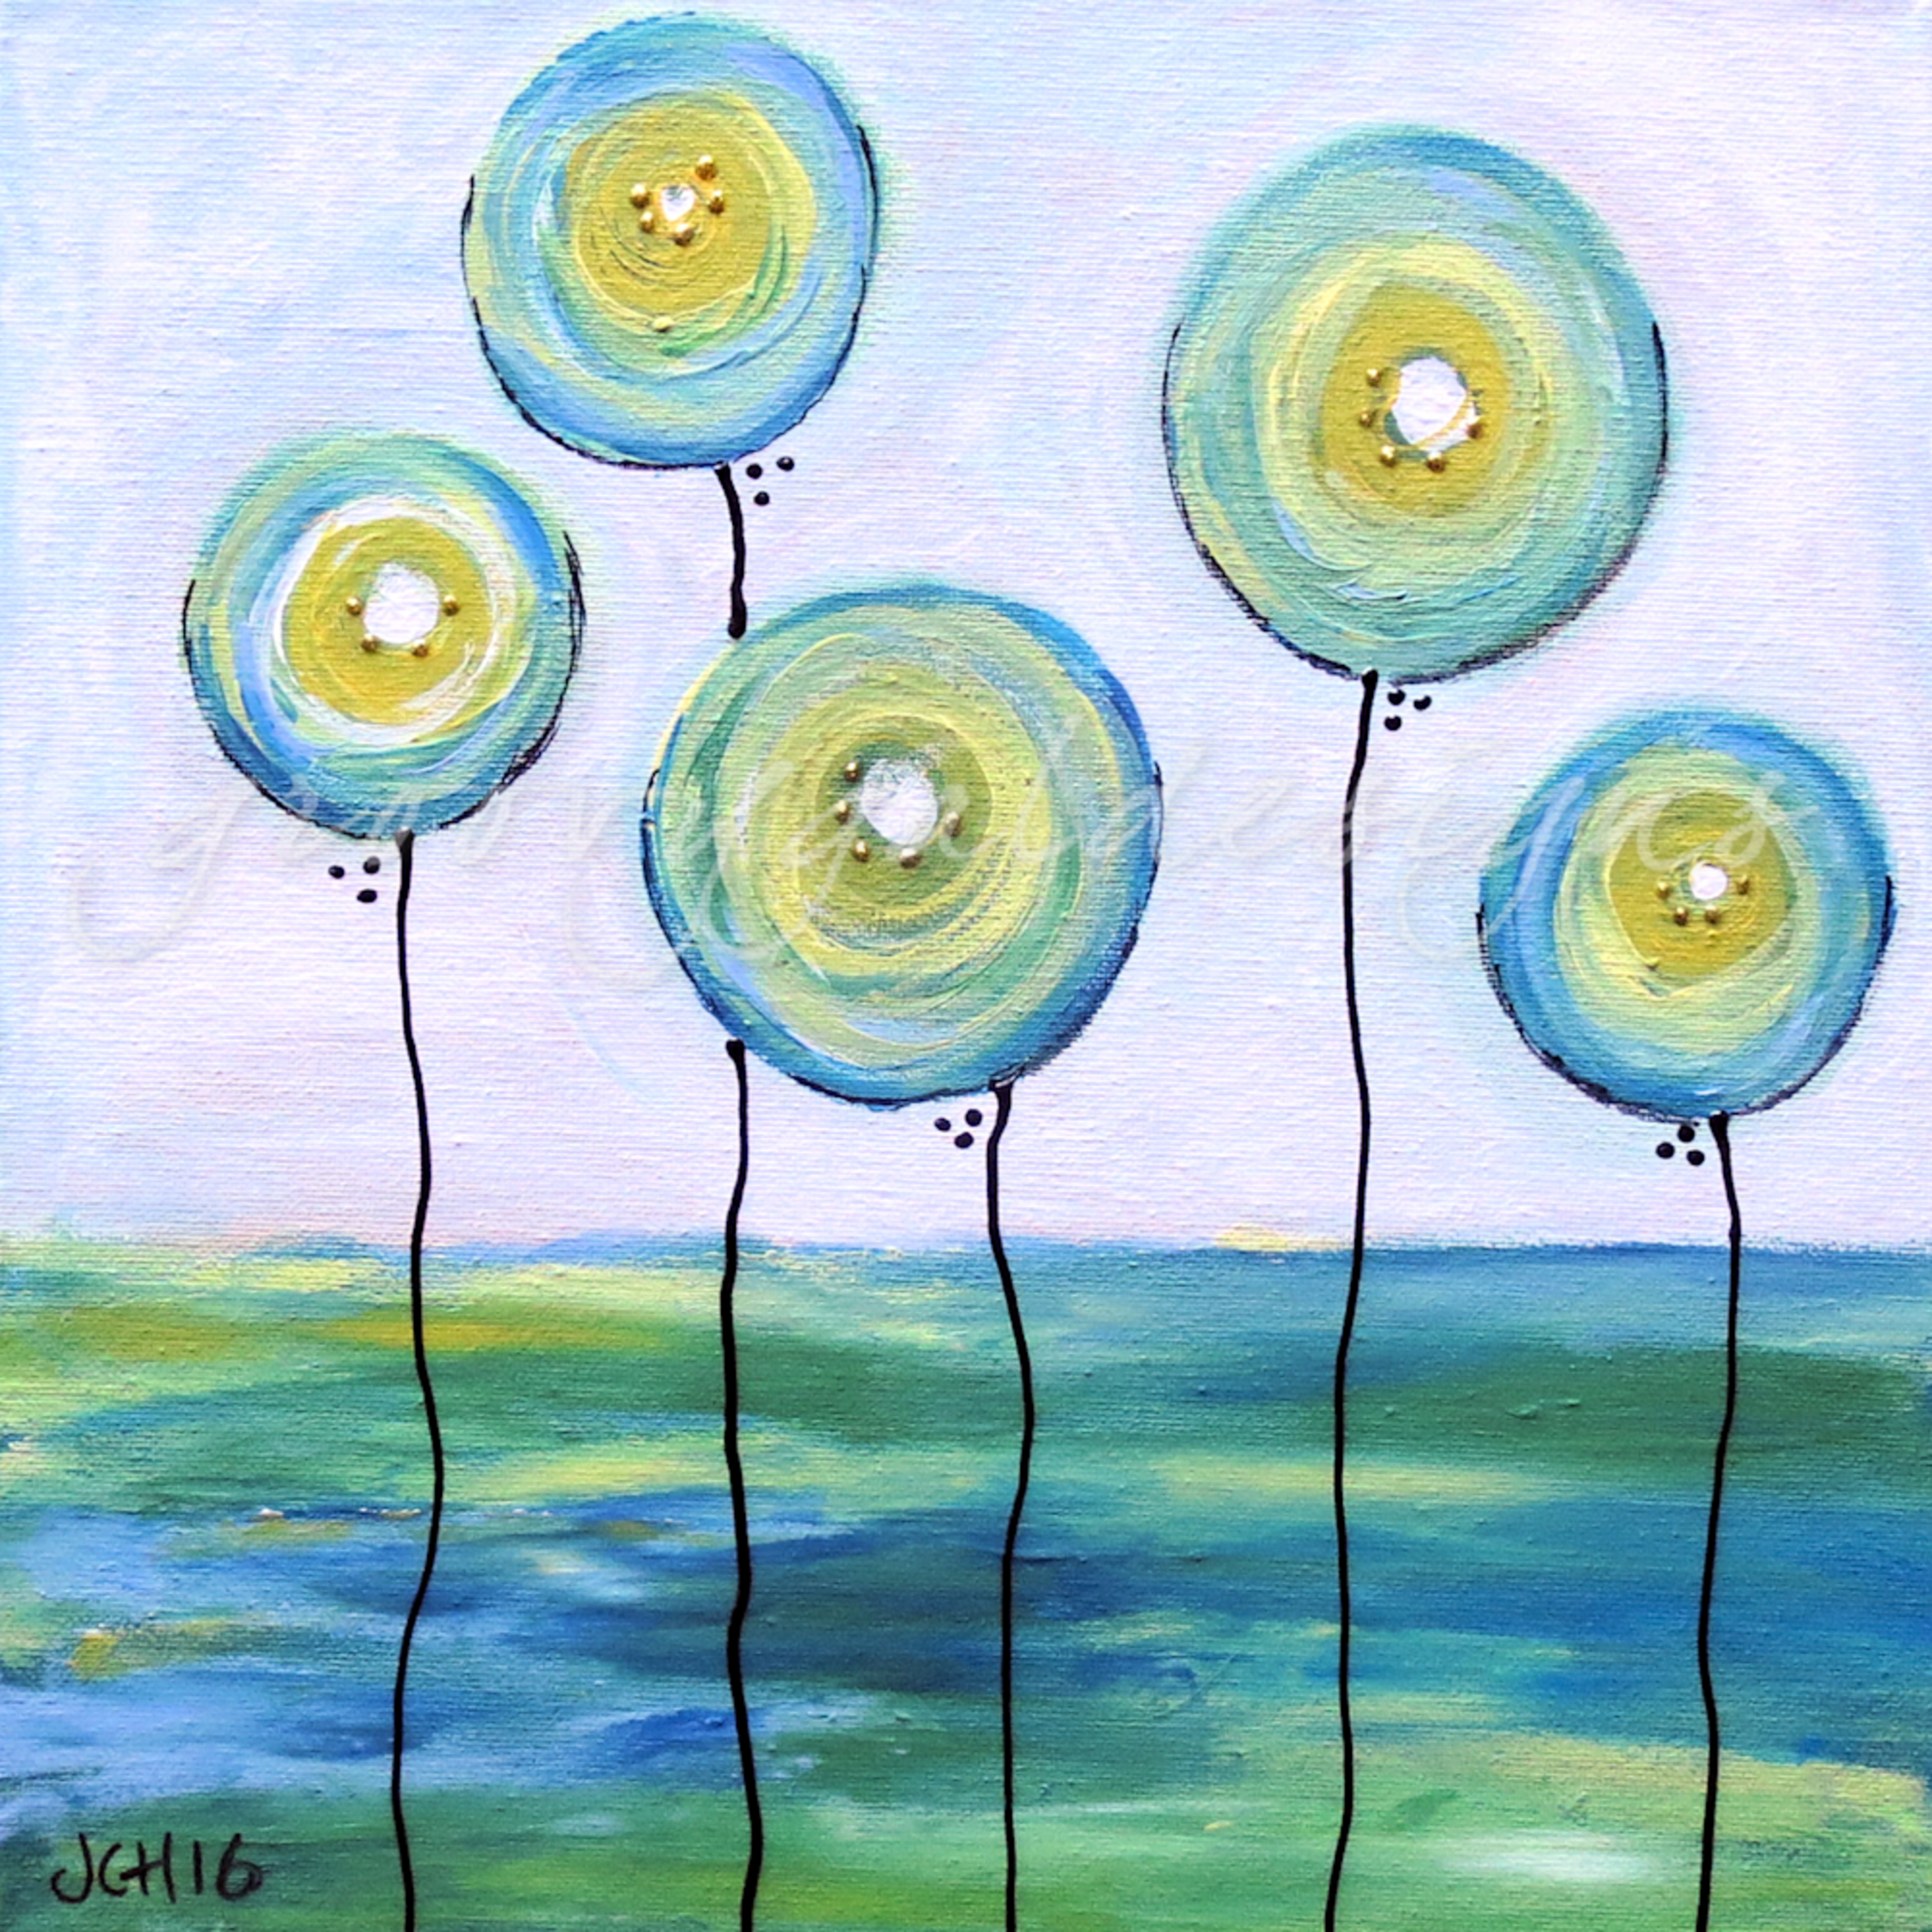 Blue balloons tvlhn3